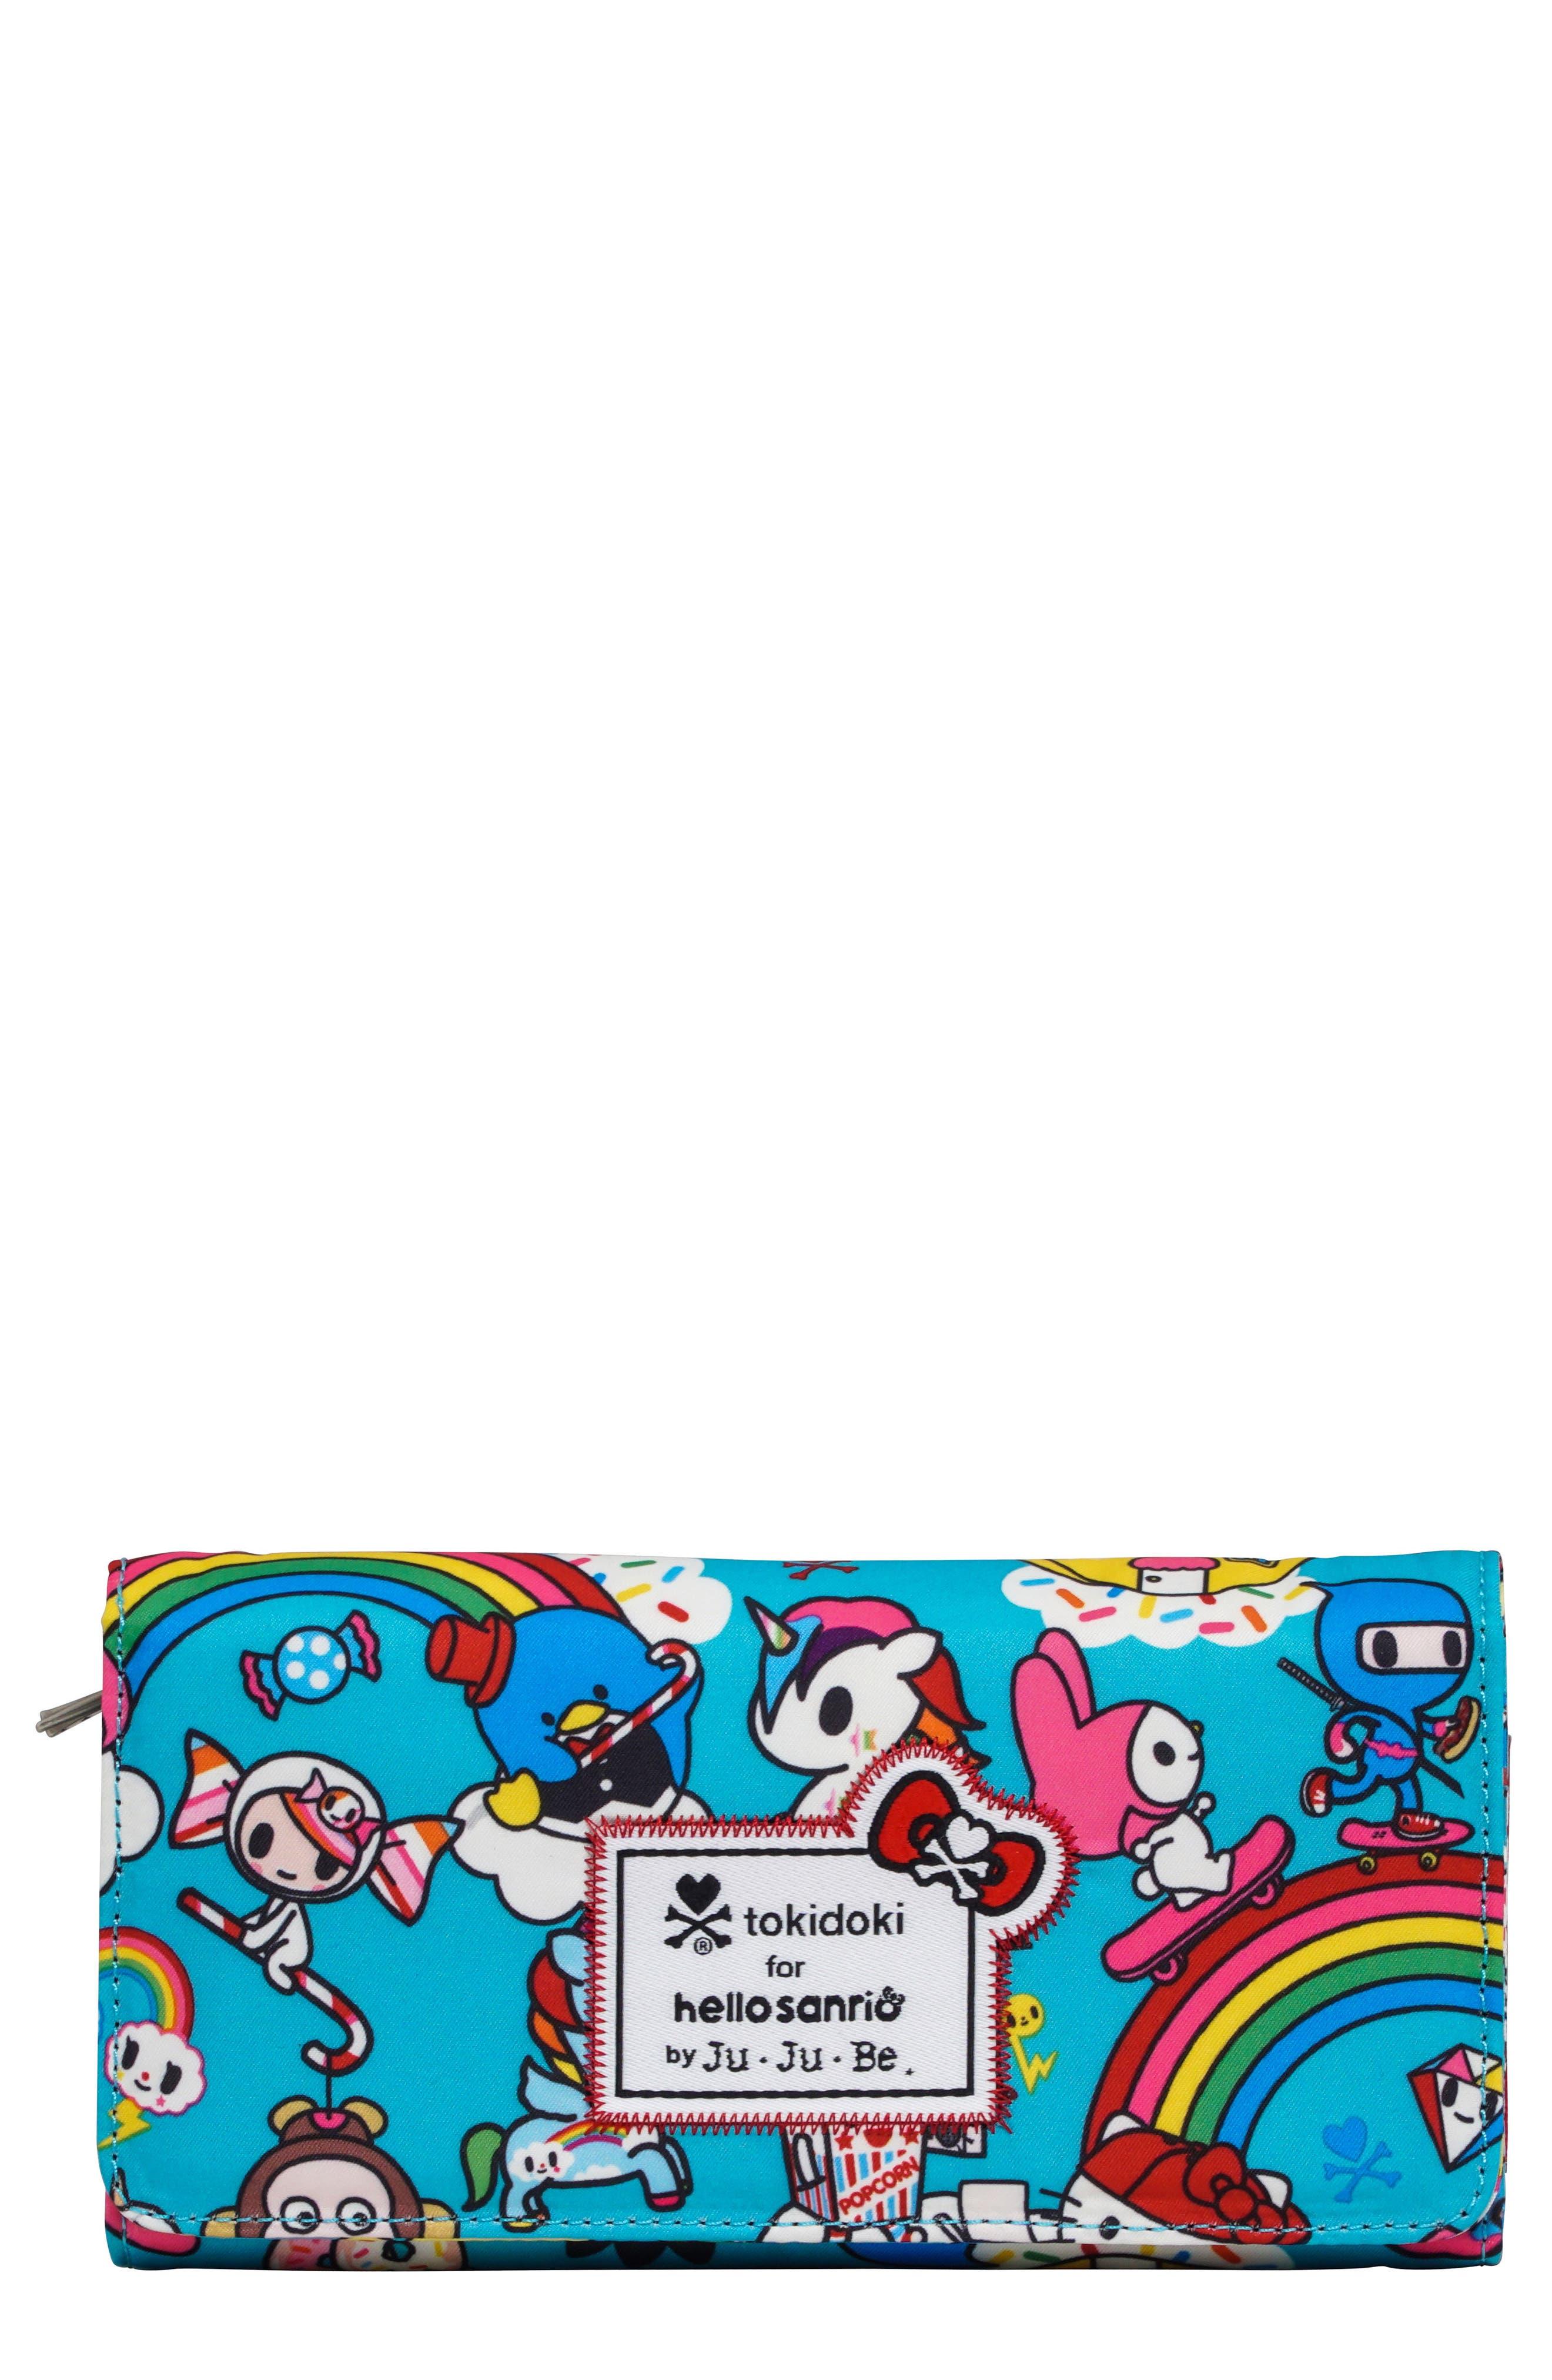 x tokidoki for Hello Sanrio Rainbow Dreams Be Rich Trifold Clutch Wallet,                             Main thumbnail 1, color,                             RAINBOW DREAMS